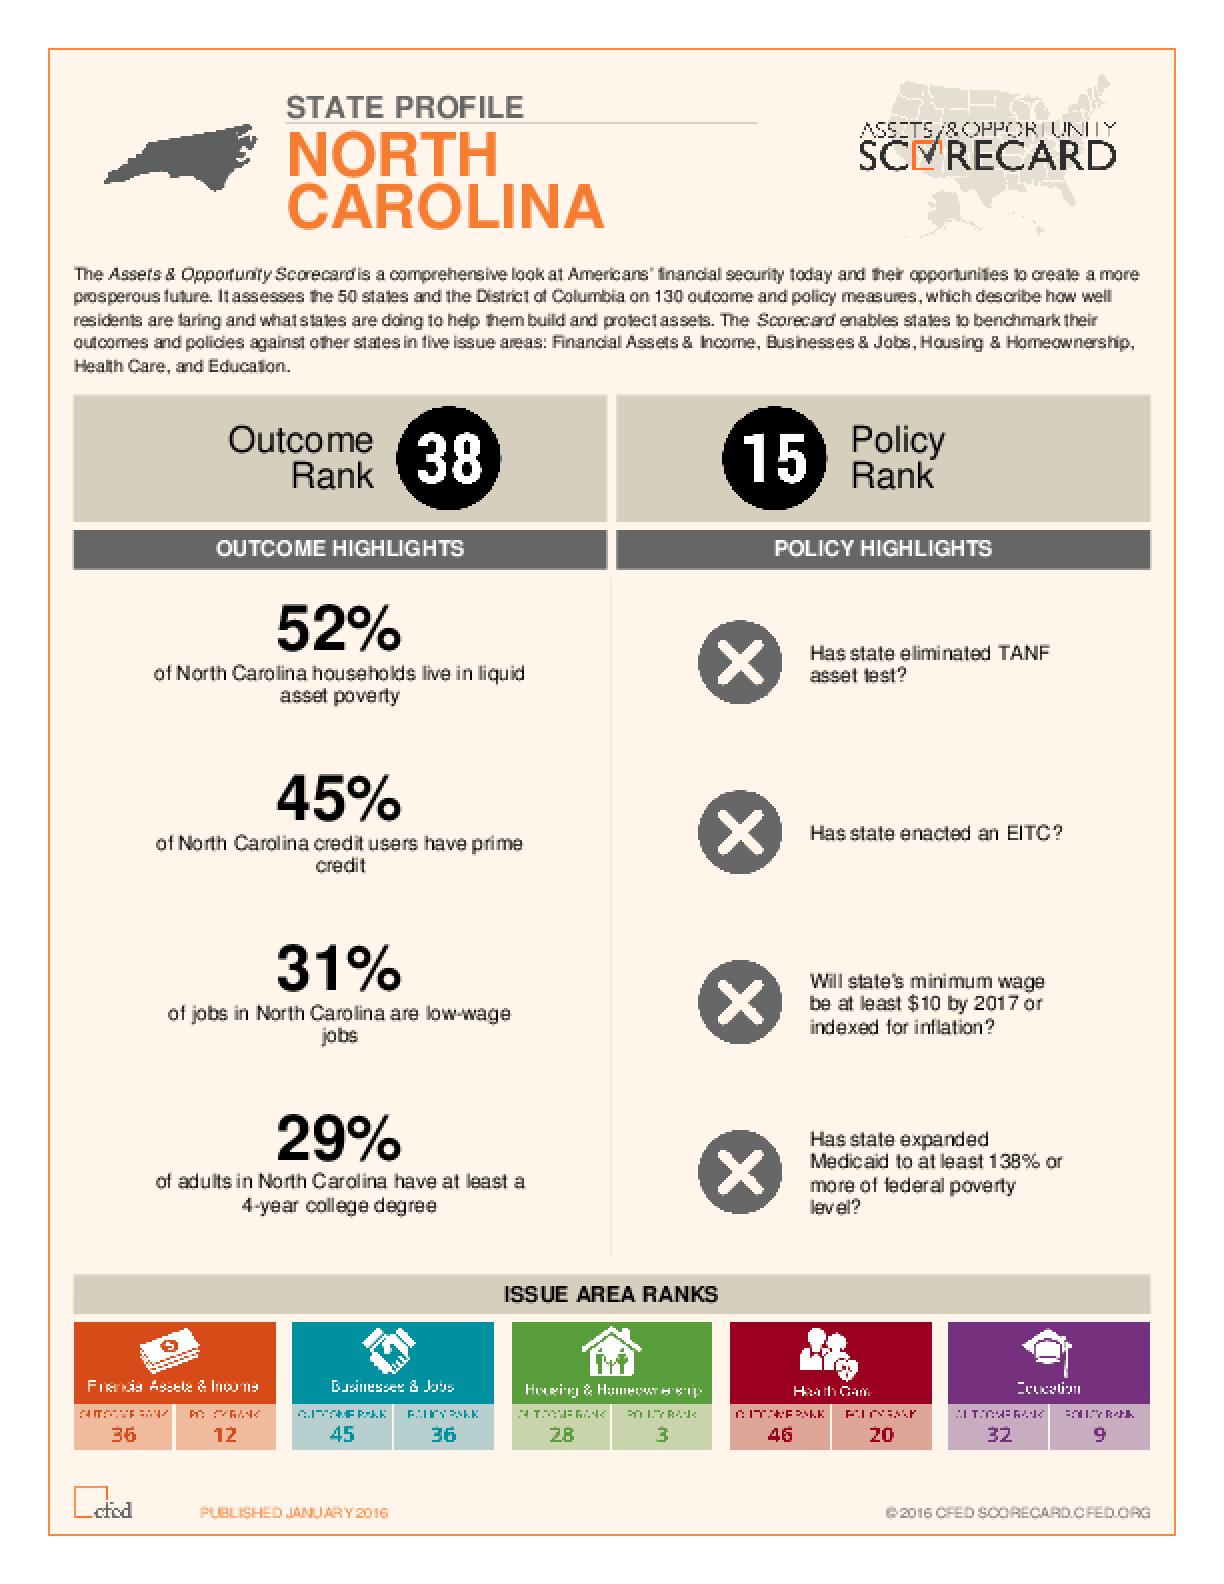 State Profile North Carolina: Assets and Opportunity Scorecard